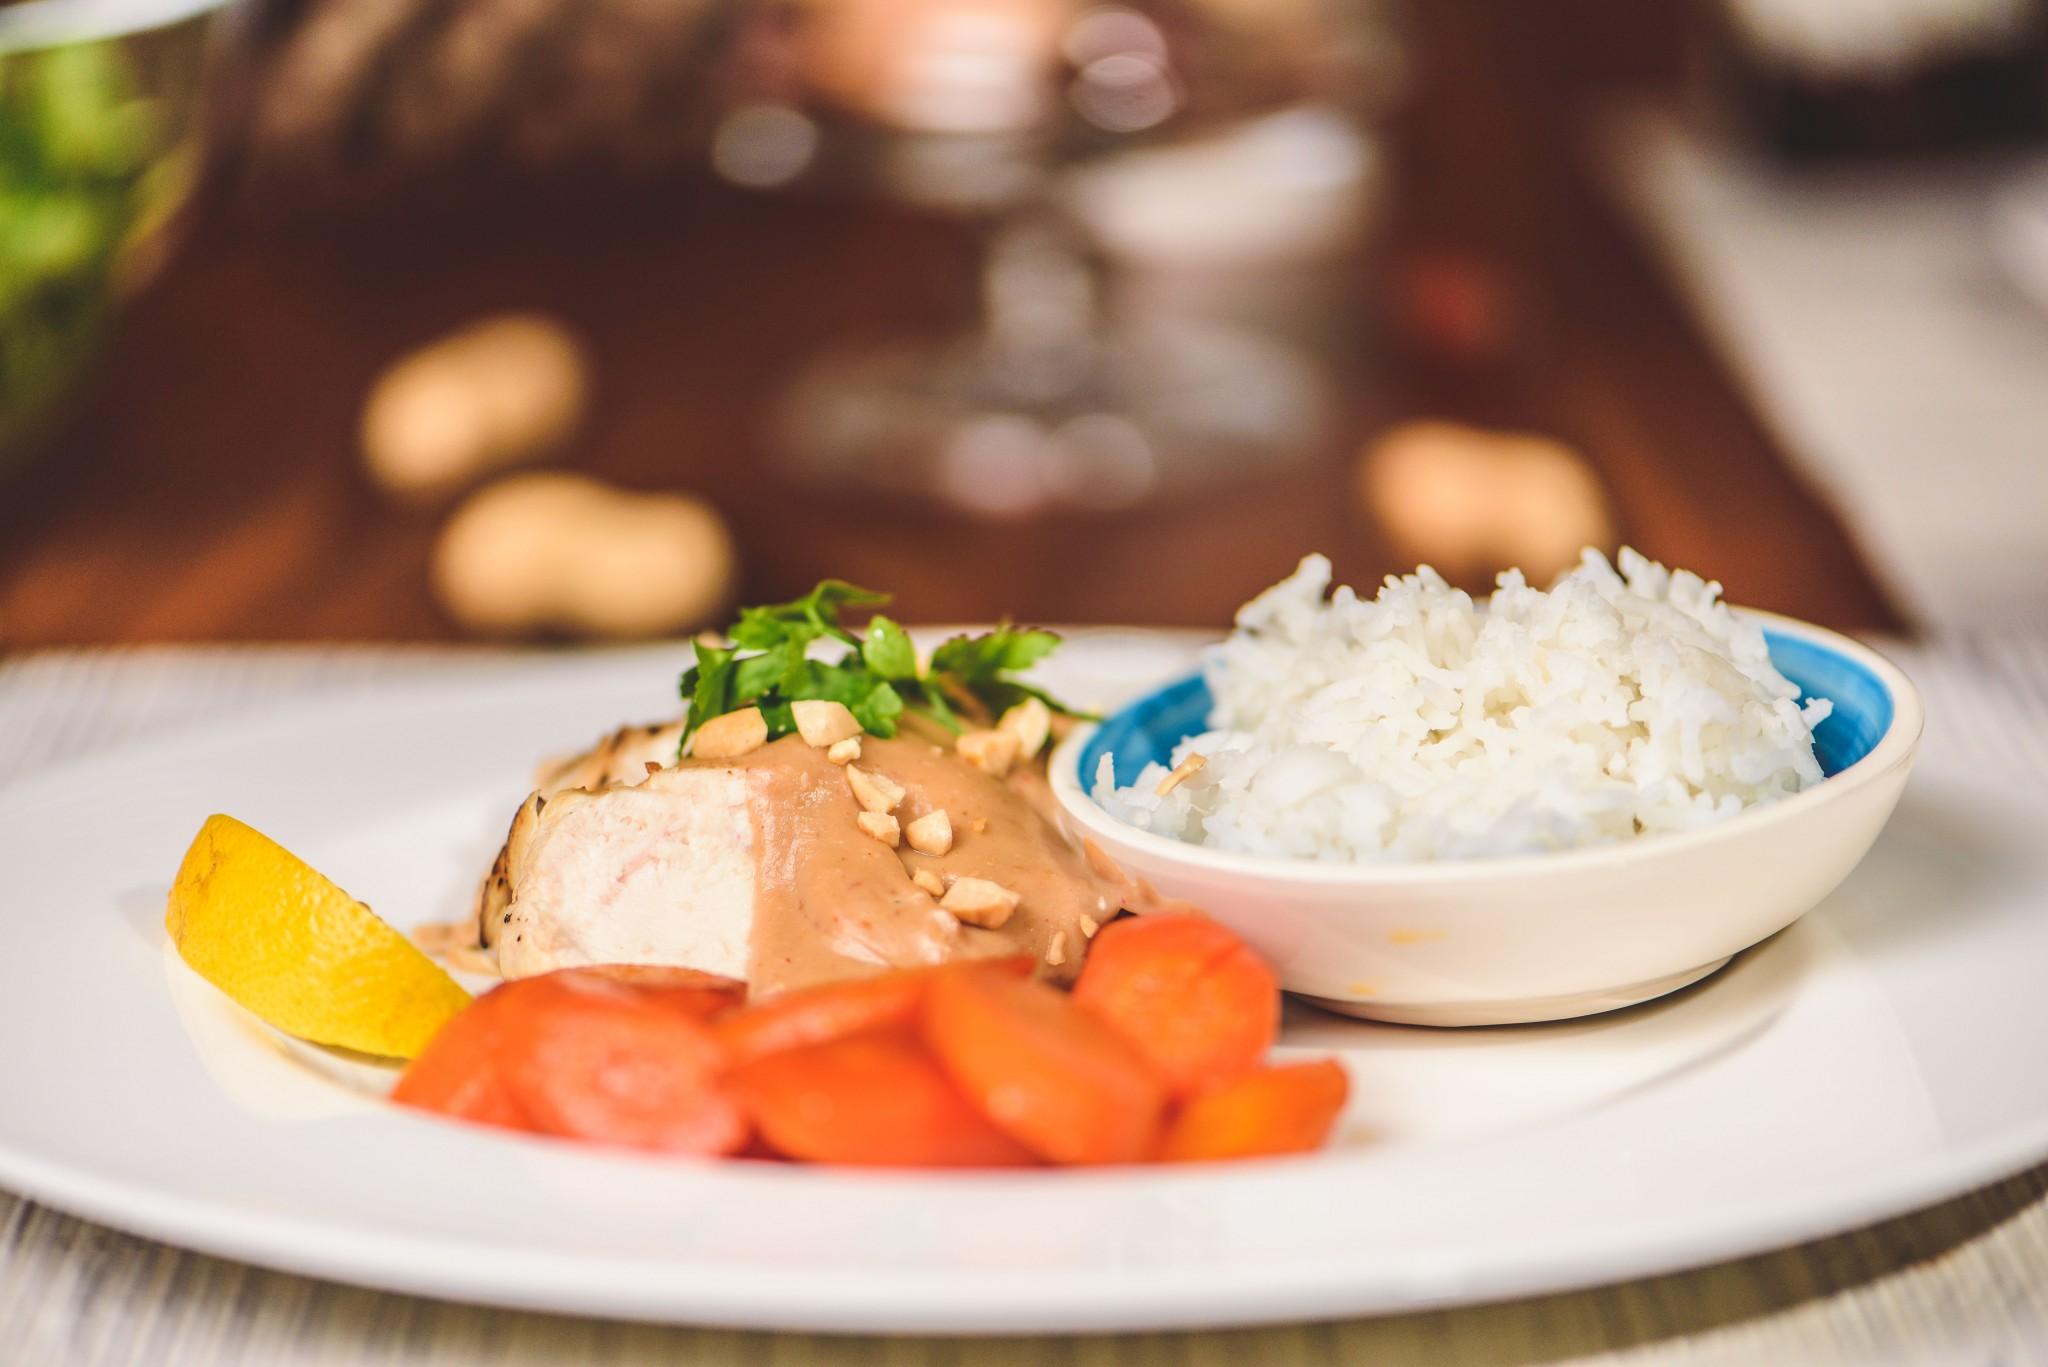 Huhn in Erdnuss-Sauce mit Karotten